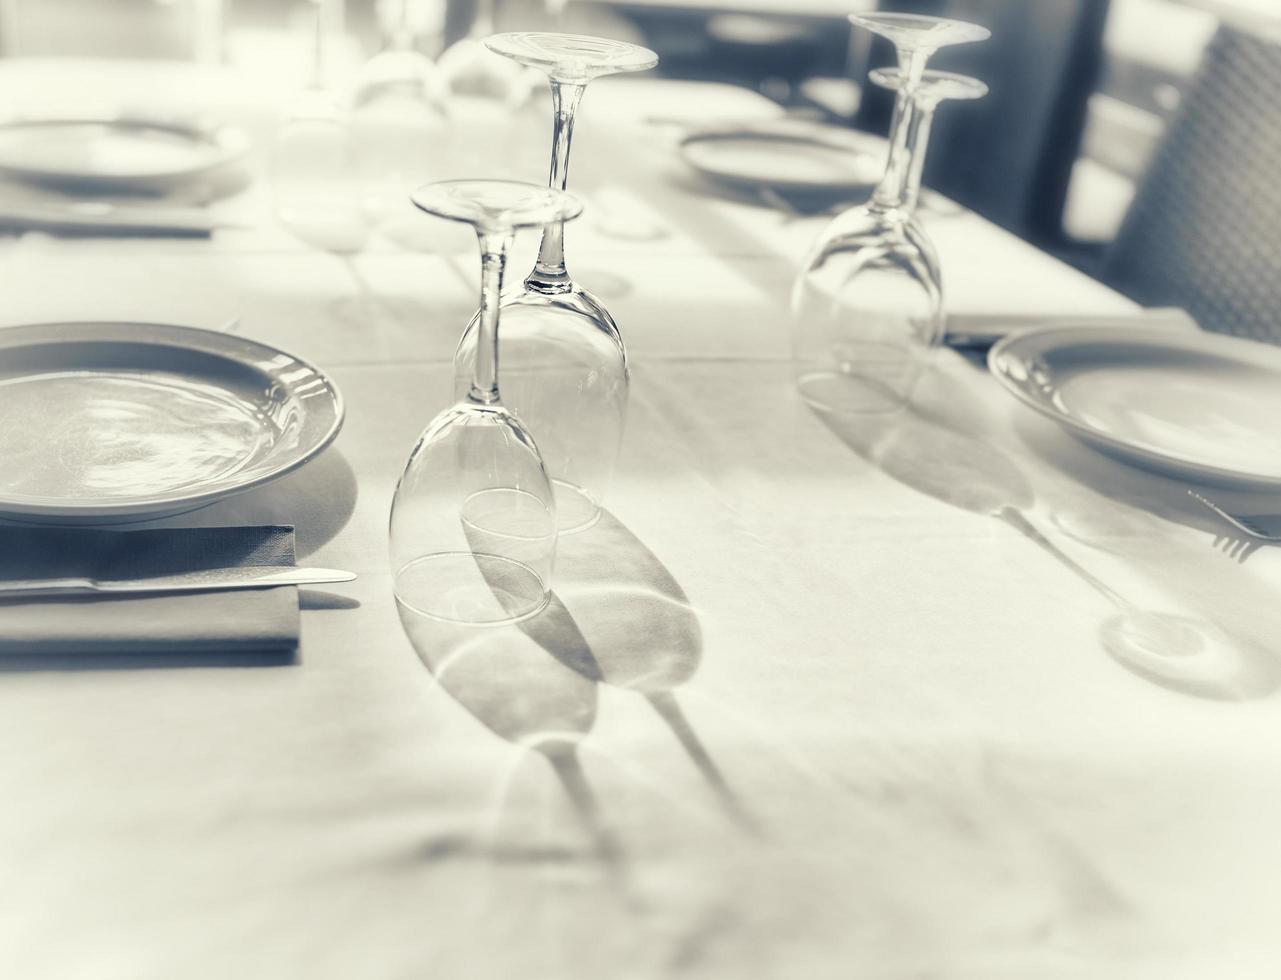 fotografia de jantares finos foto